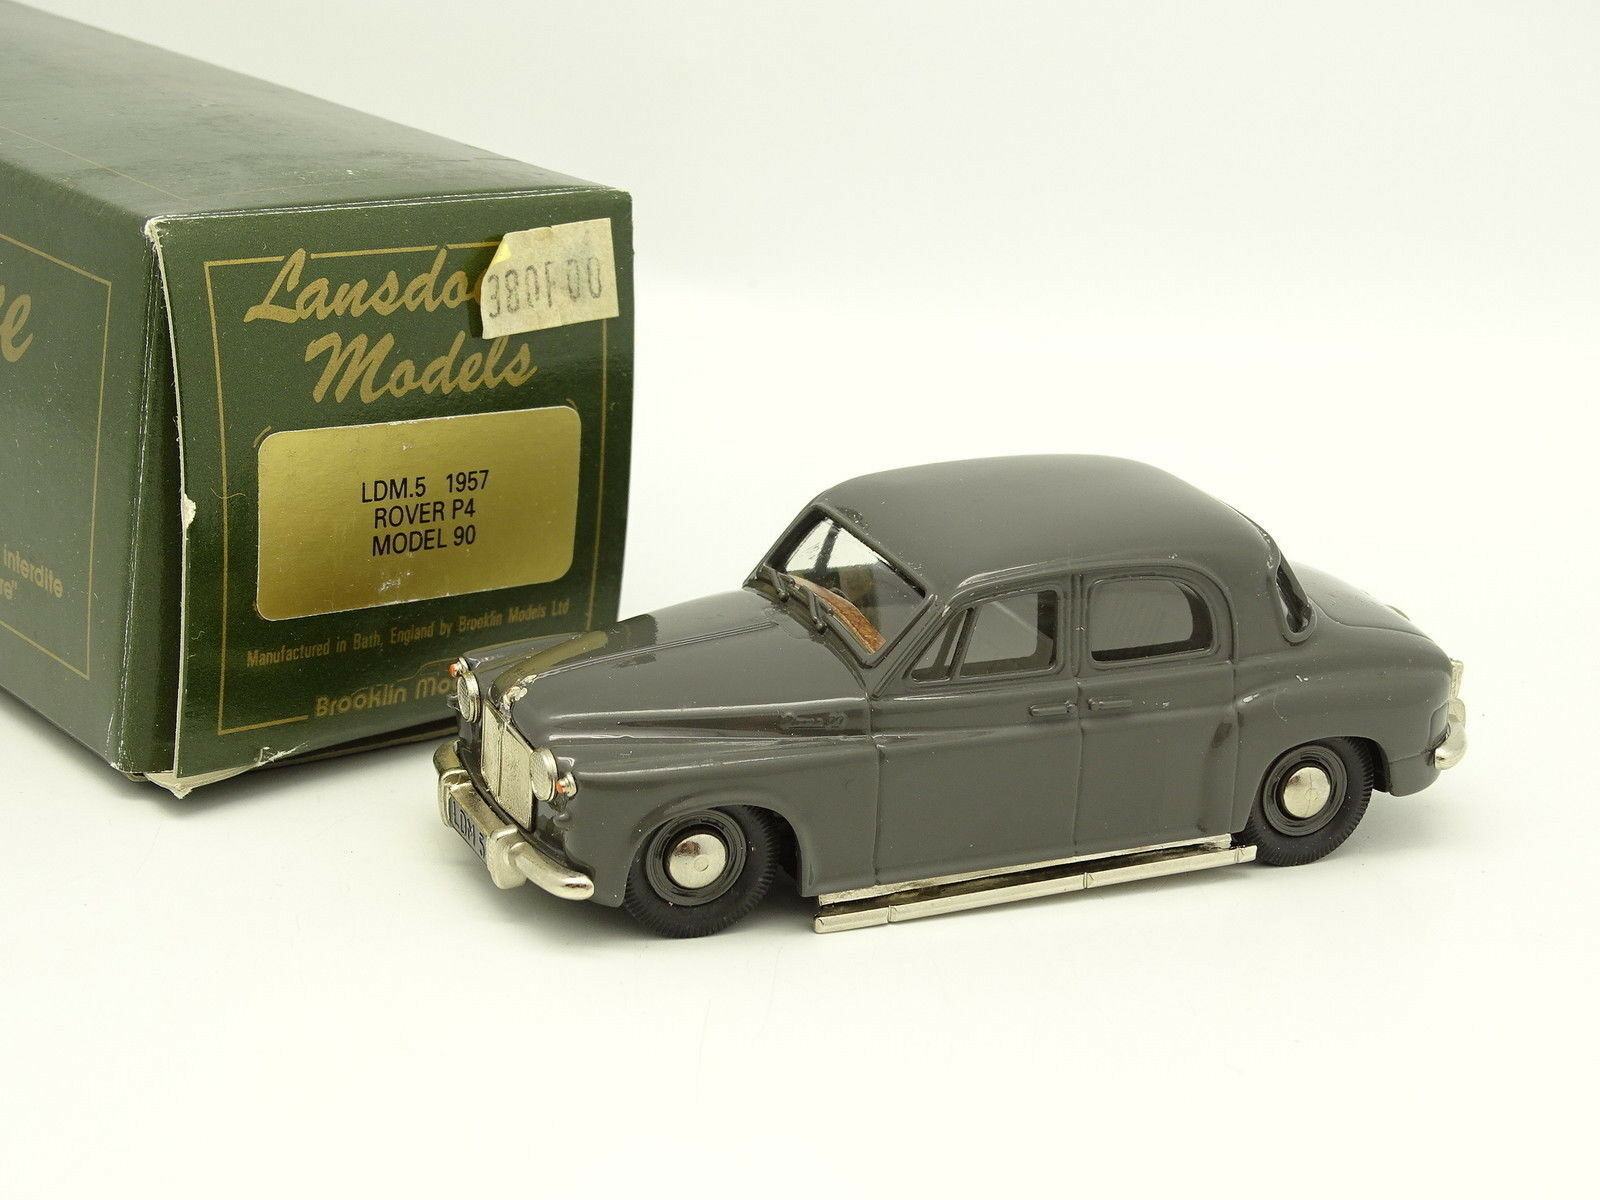 Lansdowne Models 1 43 - Rover P4 Model 90 1957